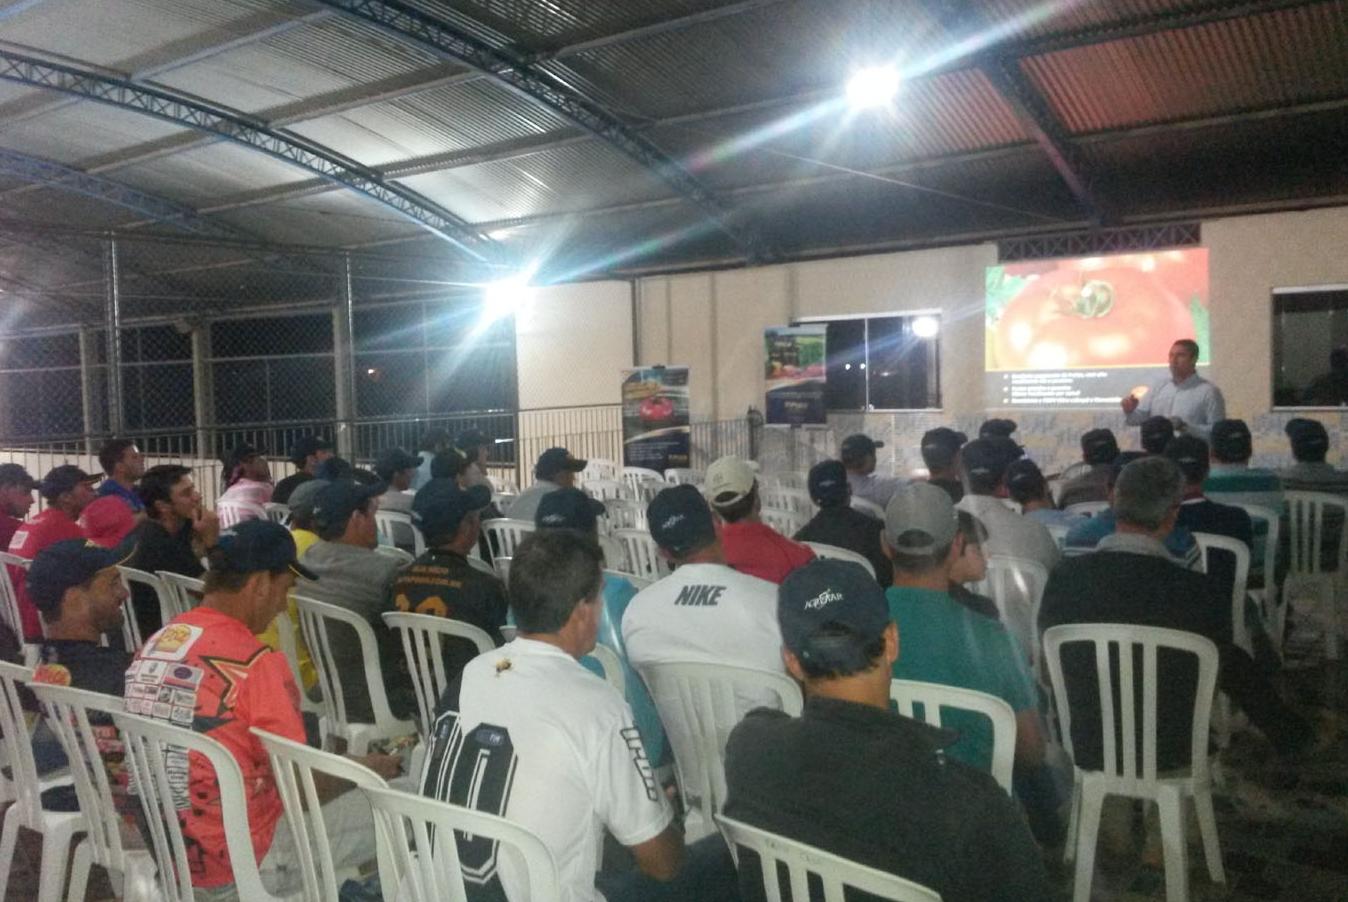 Topseed Premium realiza palestra sobre tomates em Sumidouro (RJ)